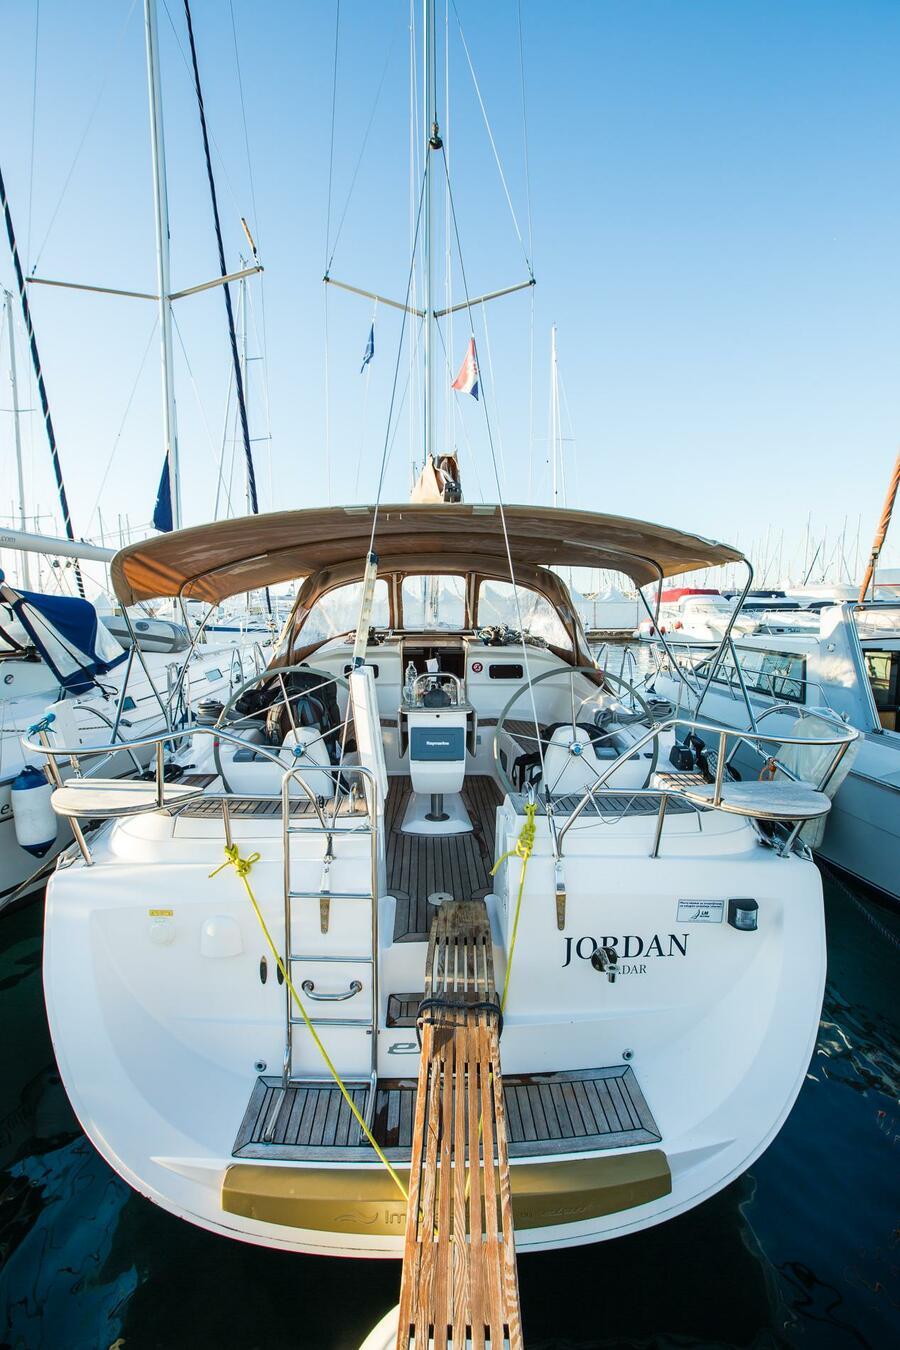 Elan 434 Impression (Jordan (sails 2015))  - 10